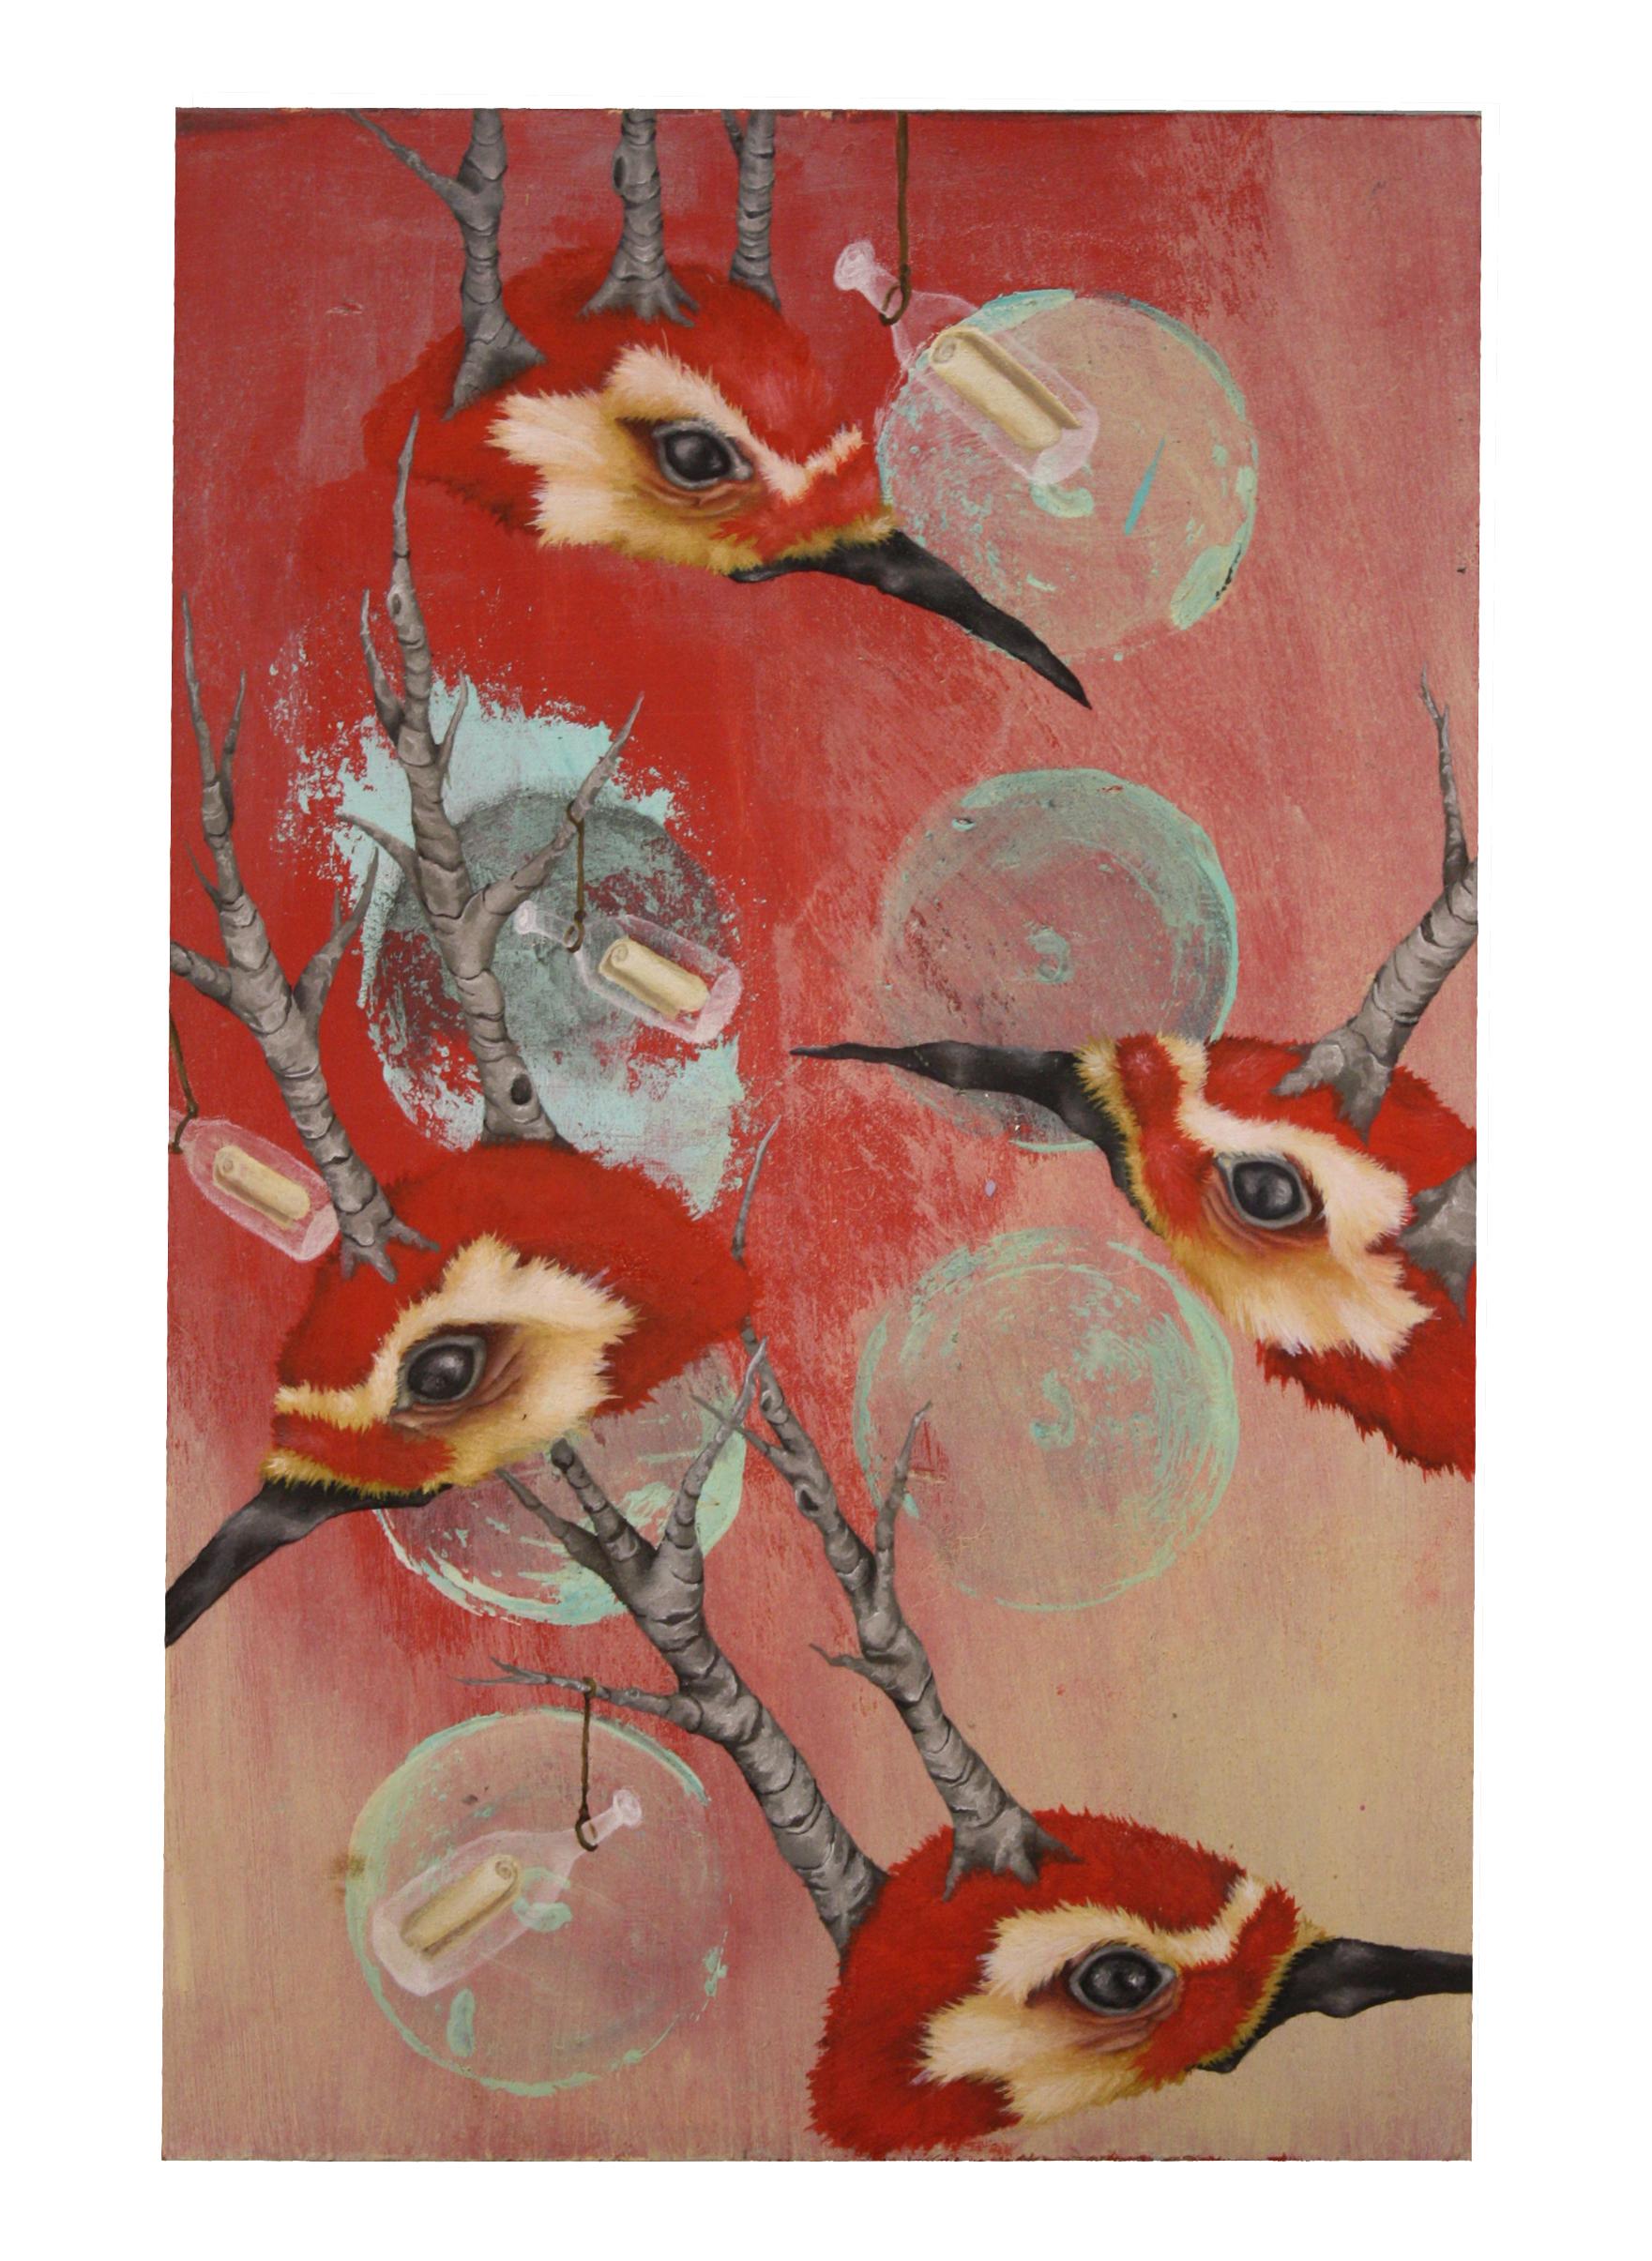 Kristen Ferrell - collaboration painting with Brett Allen